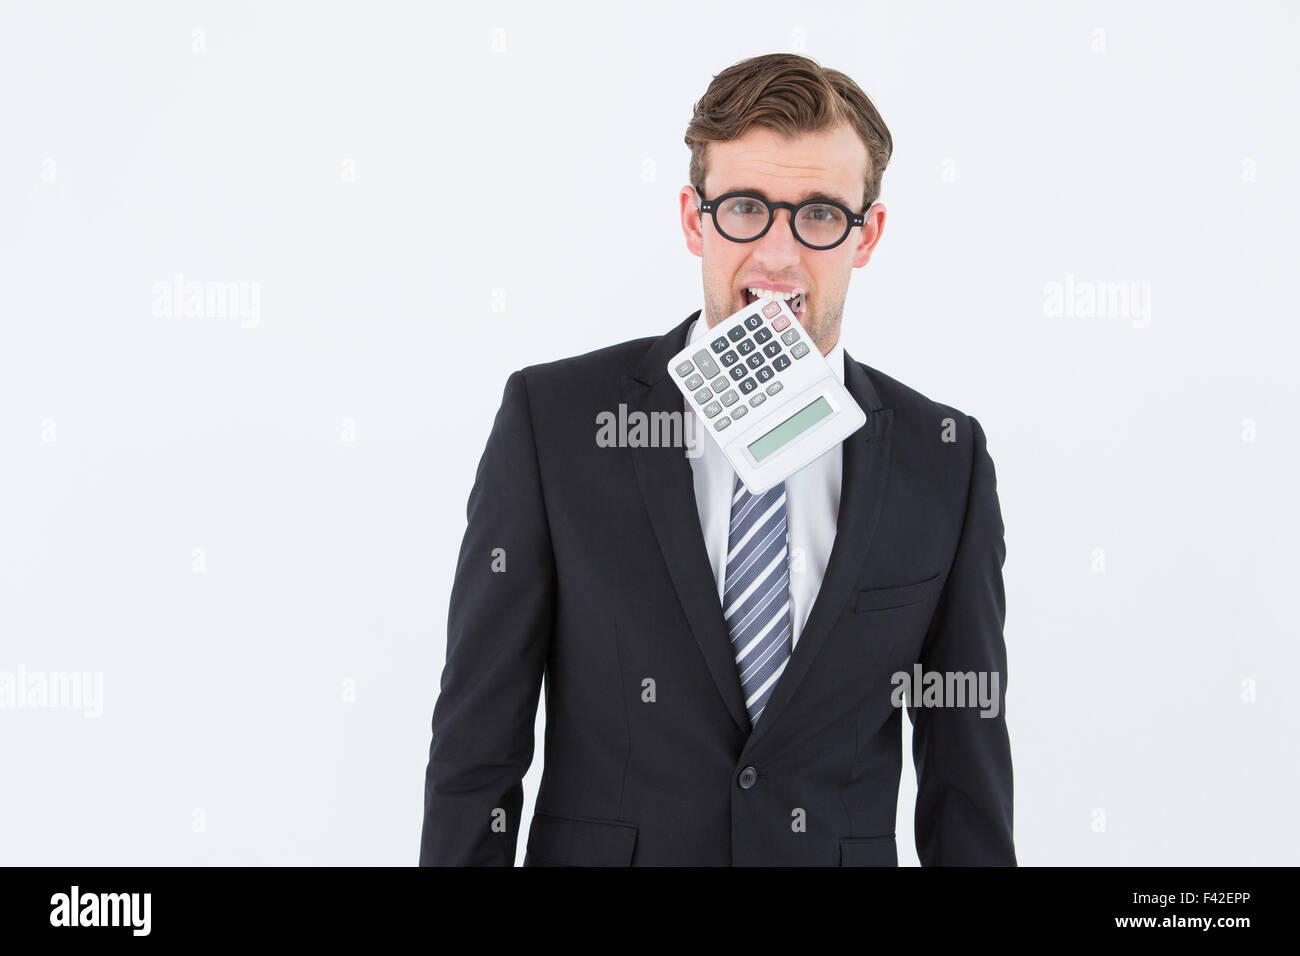 Geeky businessman biting calculator - Stock Image